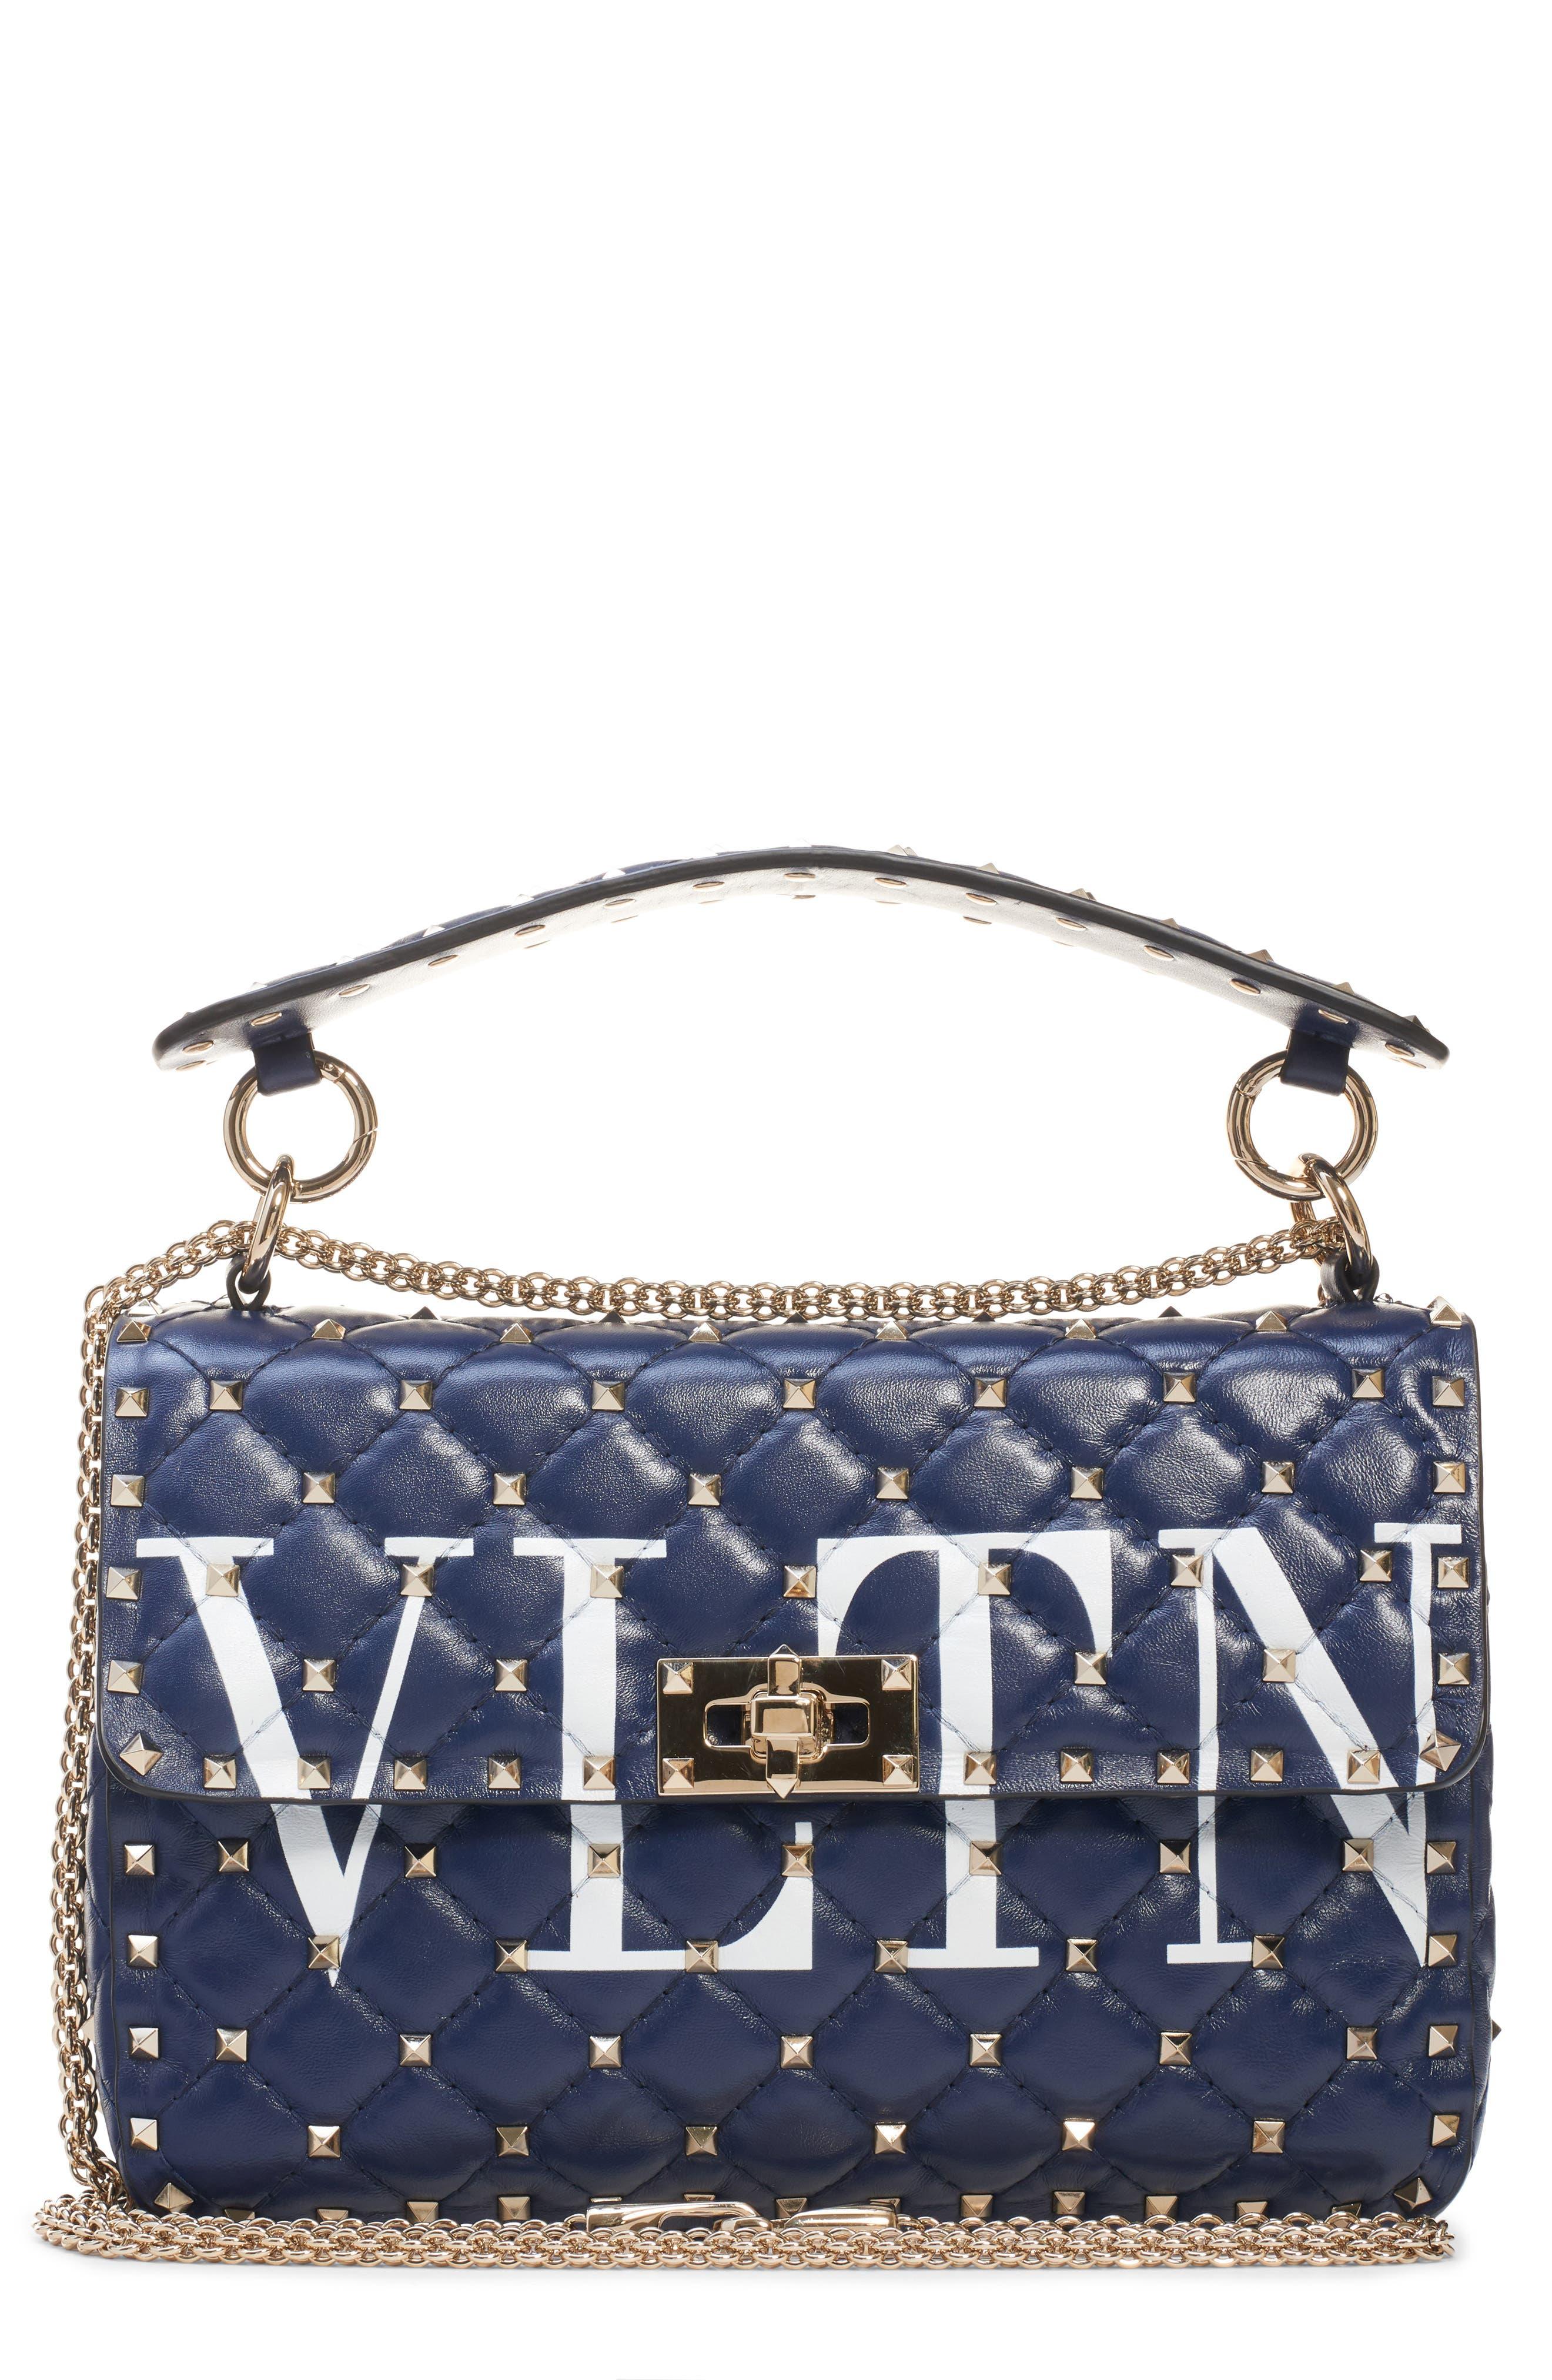 Medium Spike.It VLTN Logo Leather Shoulder Bag,                             Main thumbnail 1, color,                             PURE BLUE/ BIANCO OTTICO